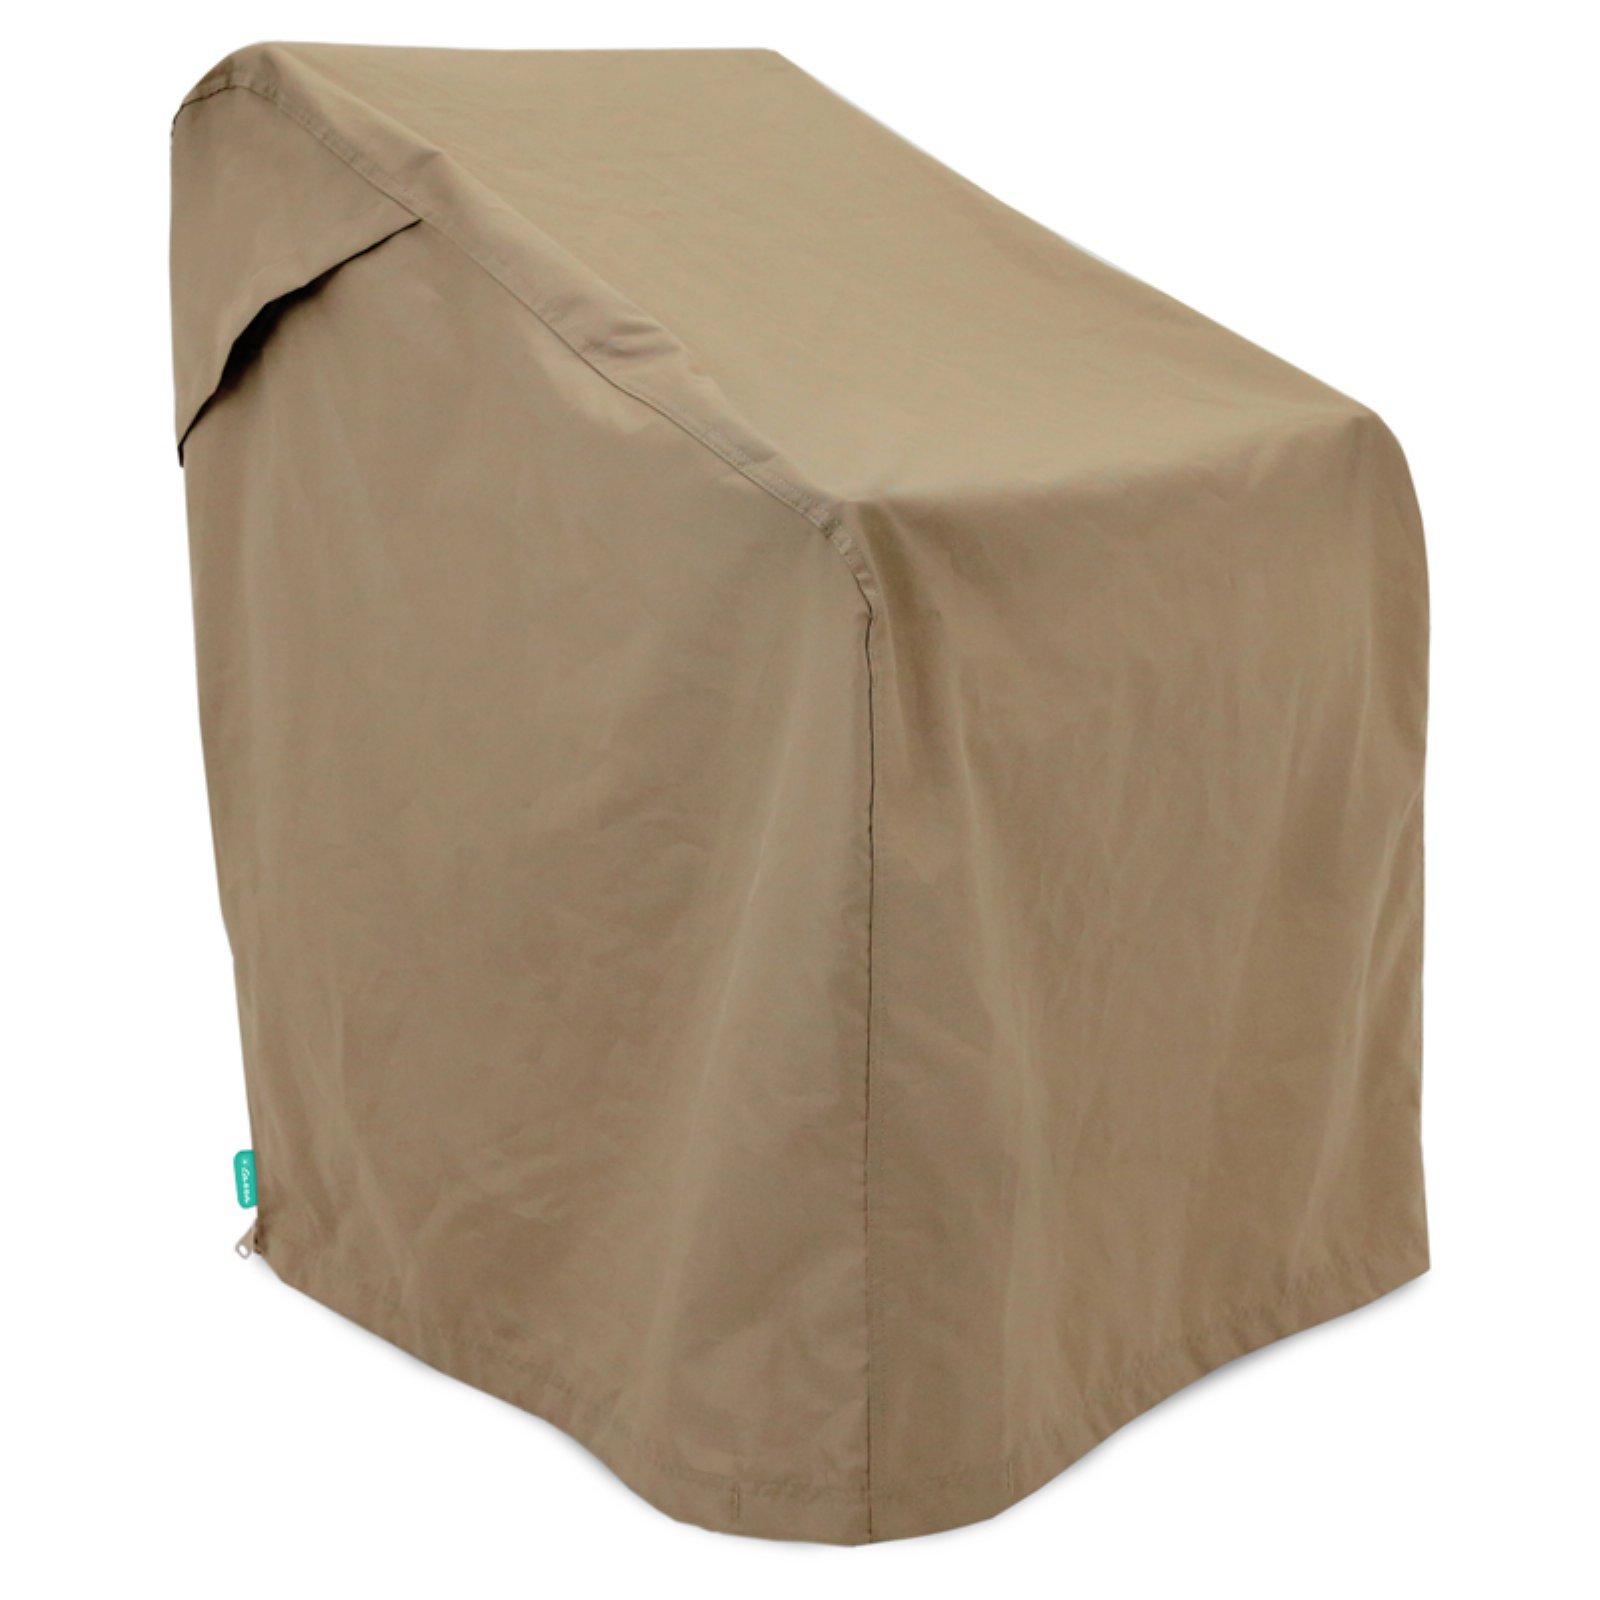 Tarra Home Universal Outdoor UFCCP343332PT Patio Chair Cover